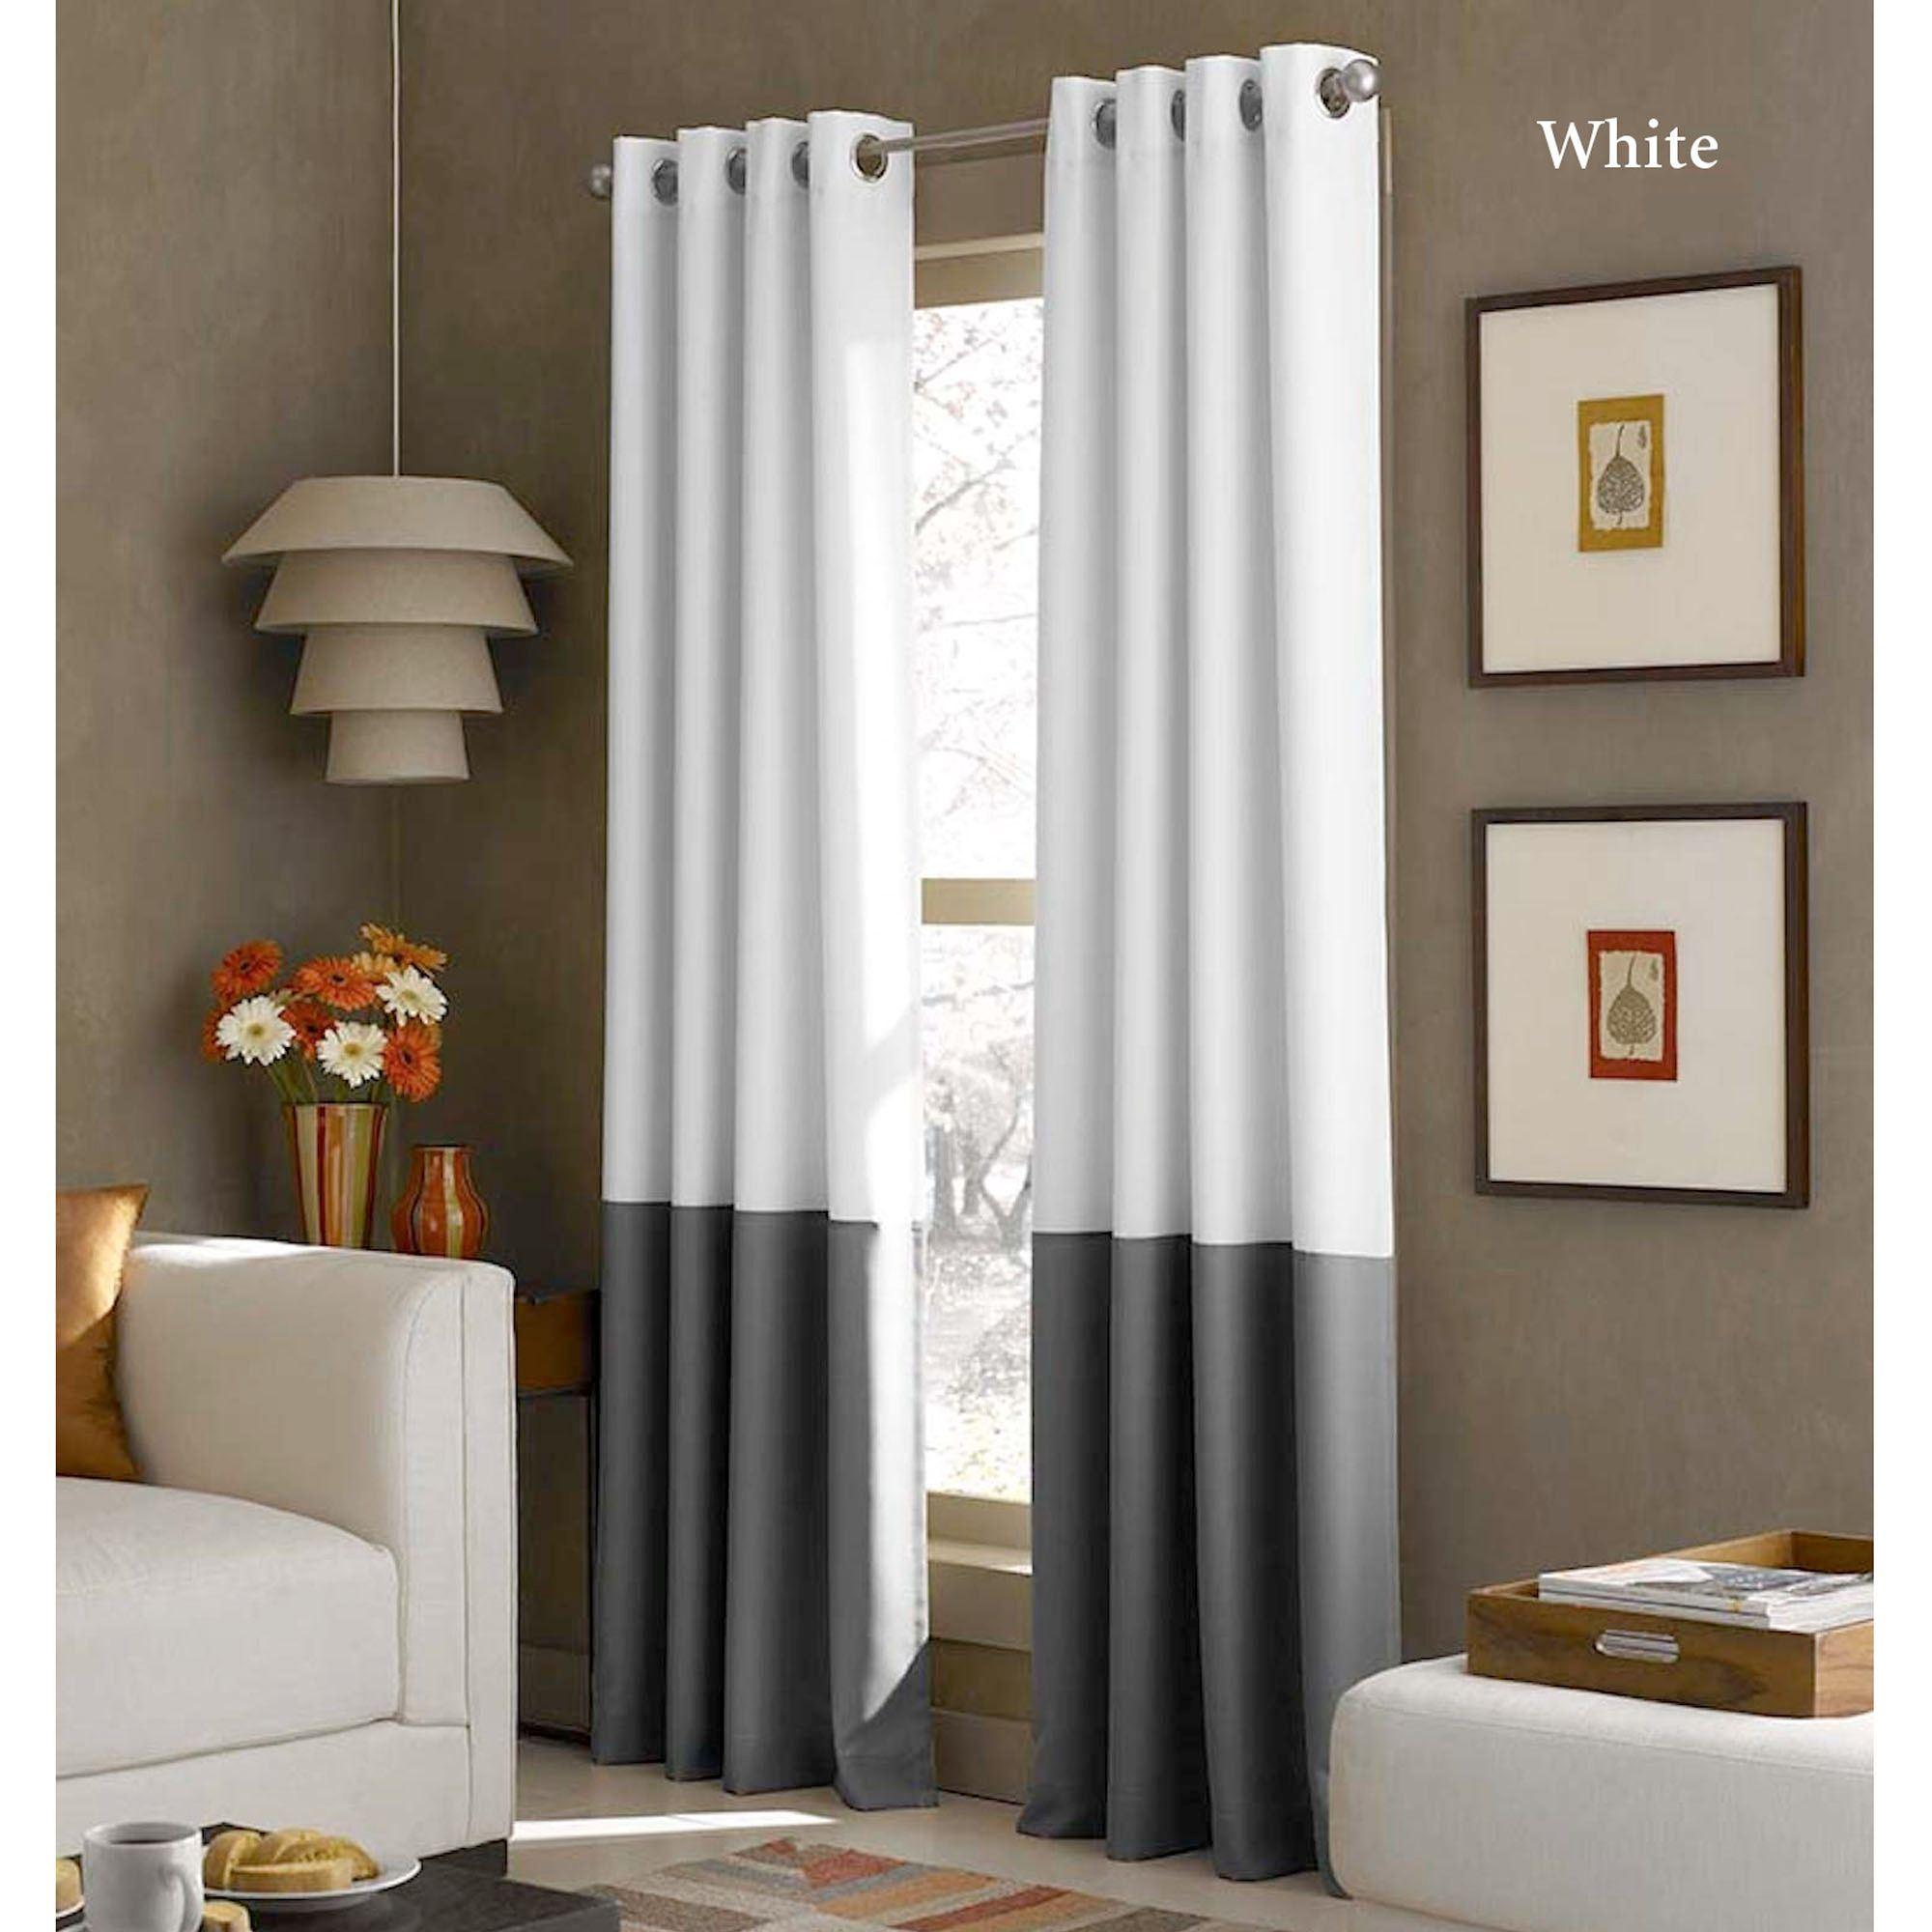 Kendallin Color Block Grommet Curtain Panels With Regard To Lined Grommet Curtain Panels (Gallery 8 of 20)